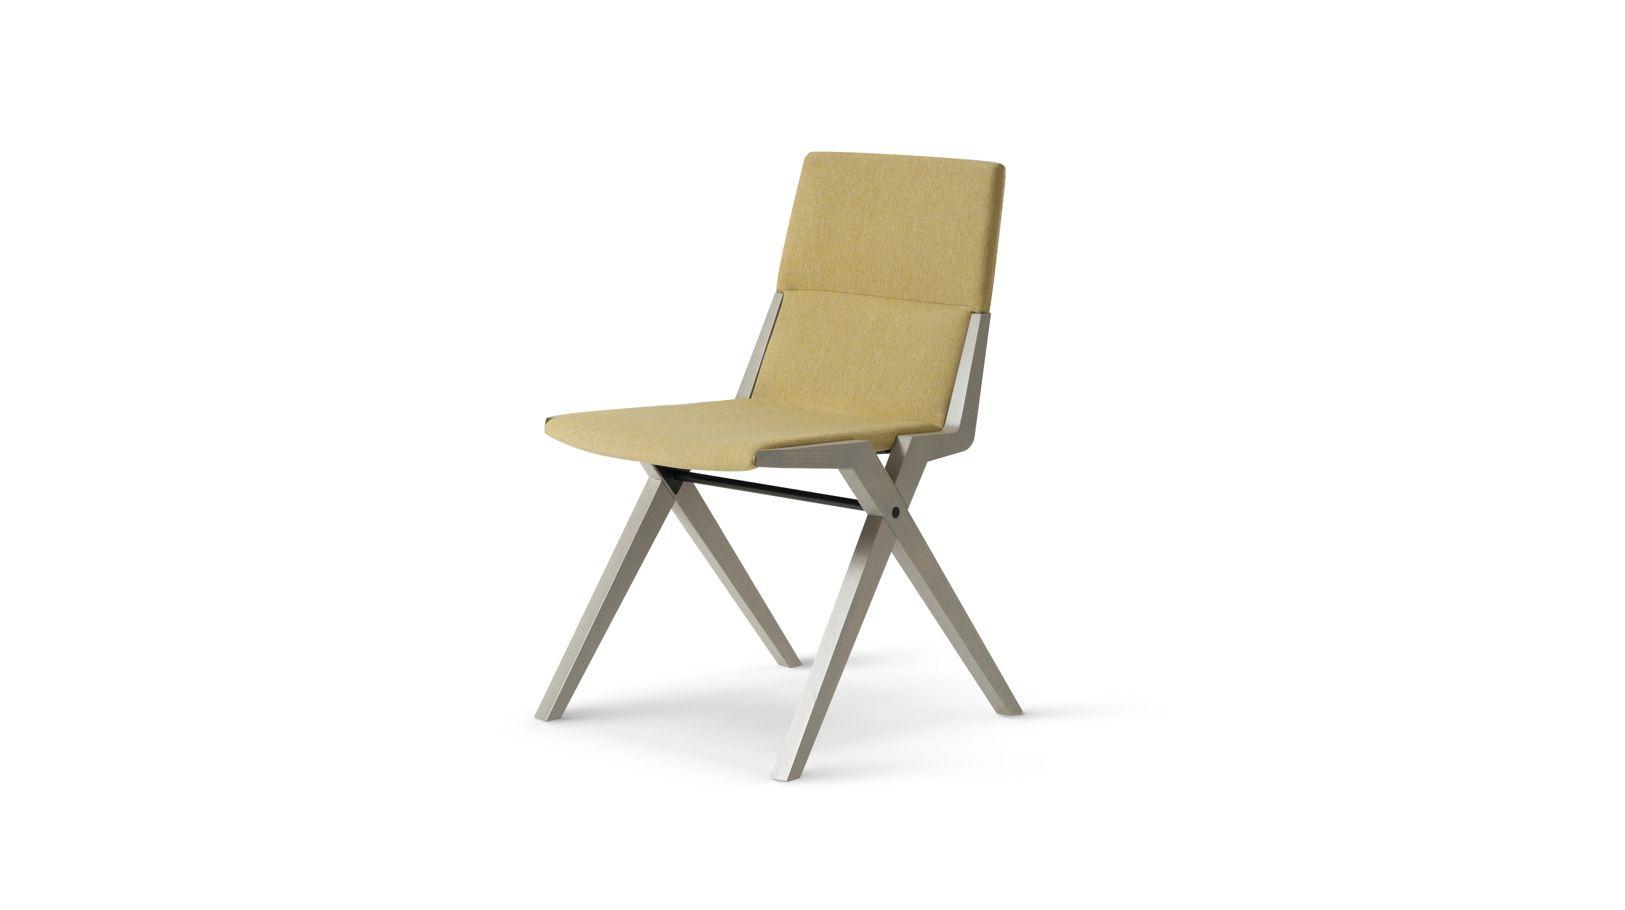 Stuhl ixilon roche bobois for Stuhl design geschichte